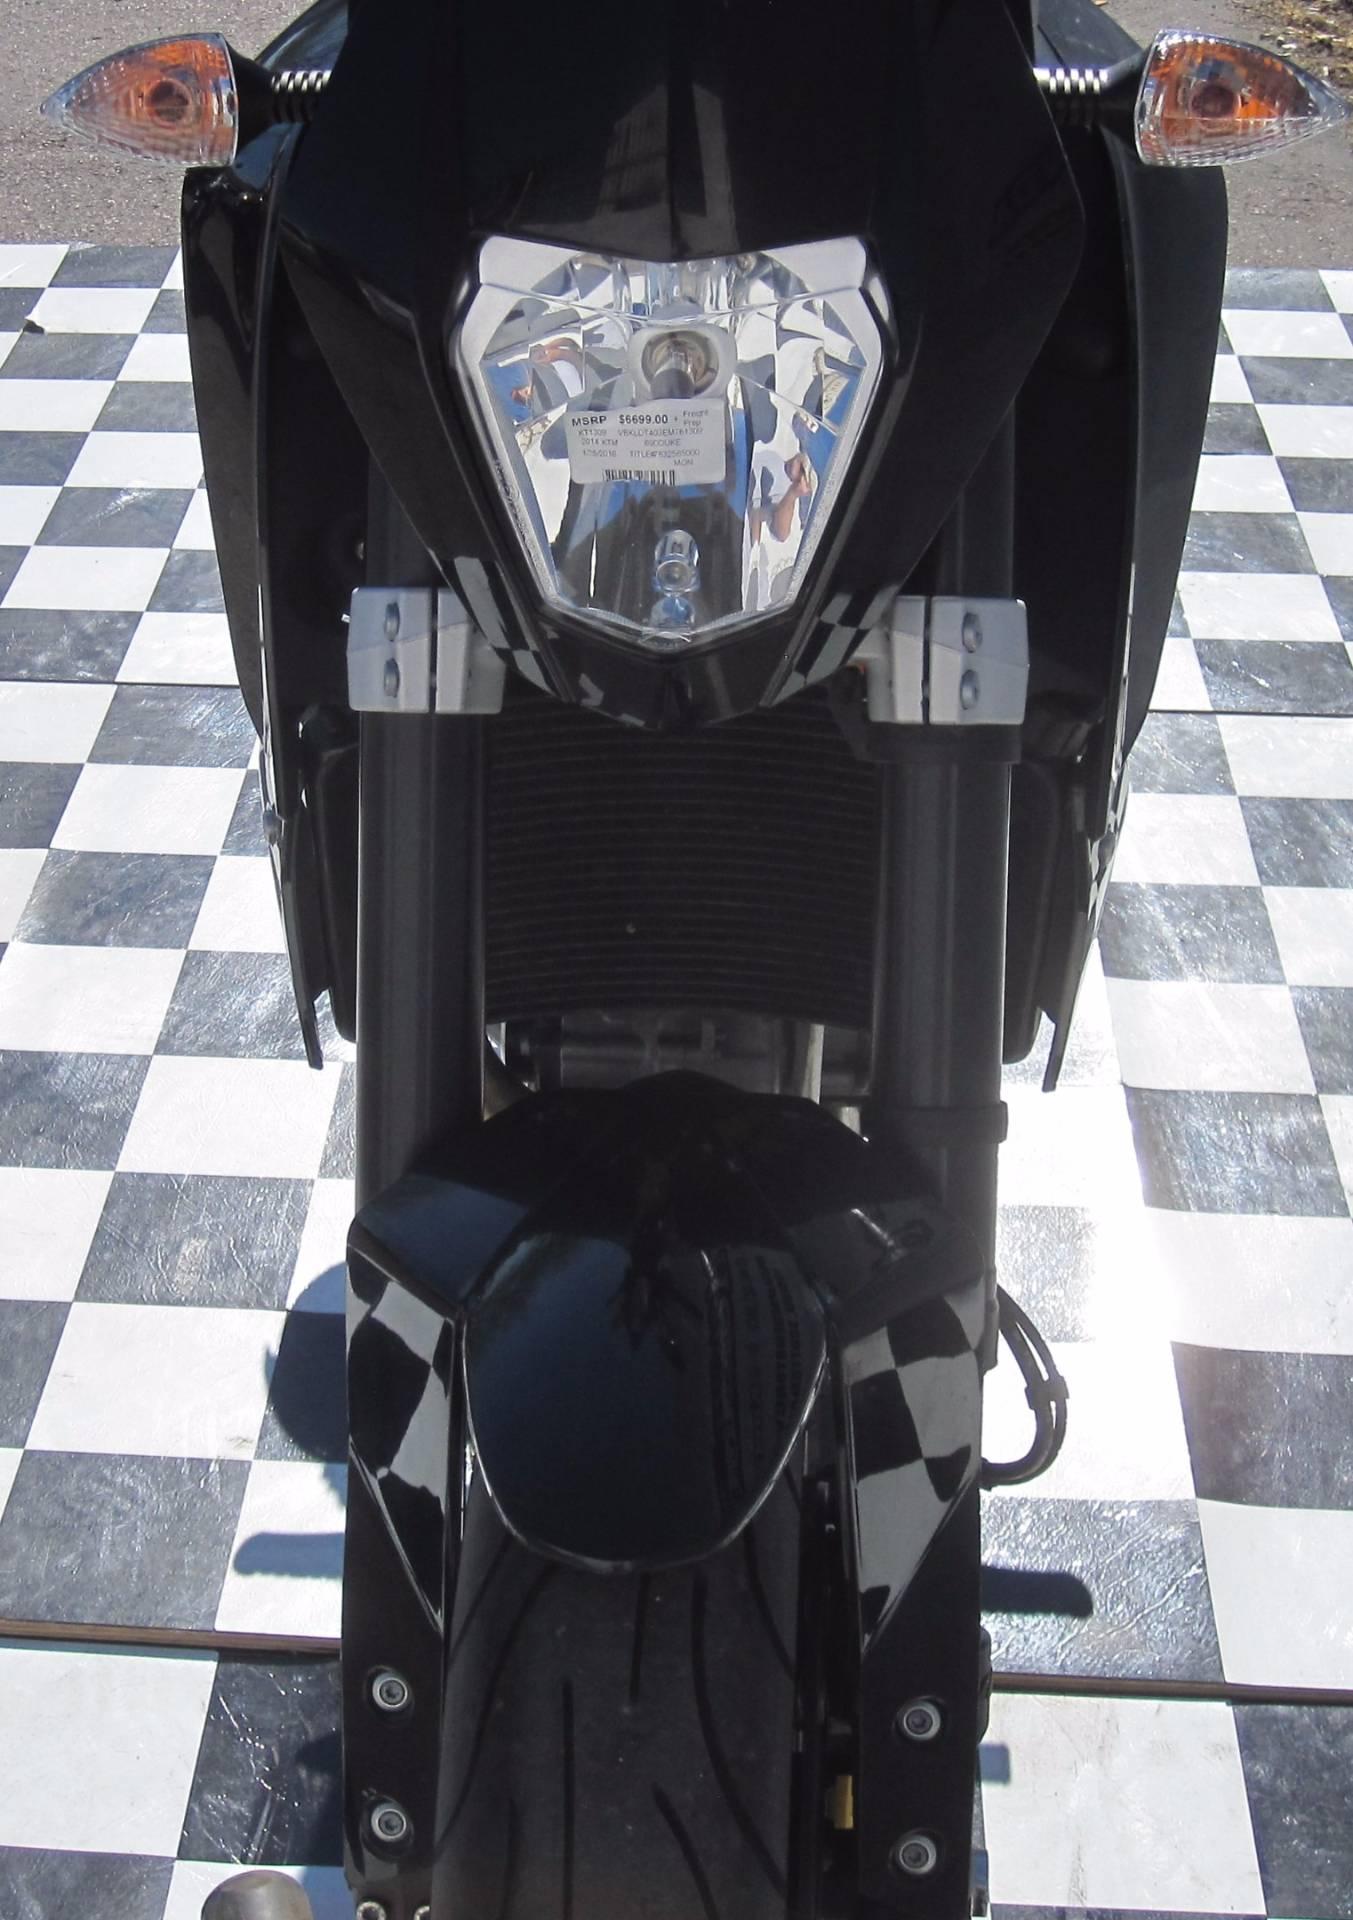 2014 KTM 690 Duke ABS in Phoenix, Arizona